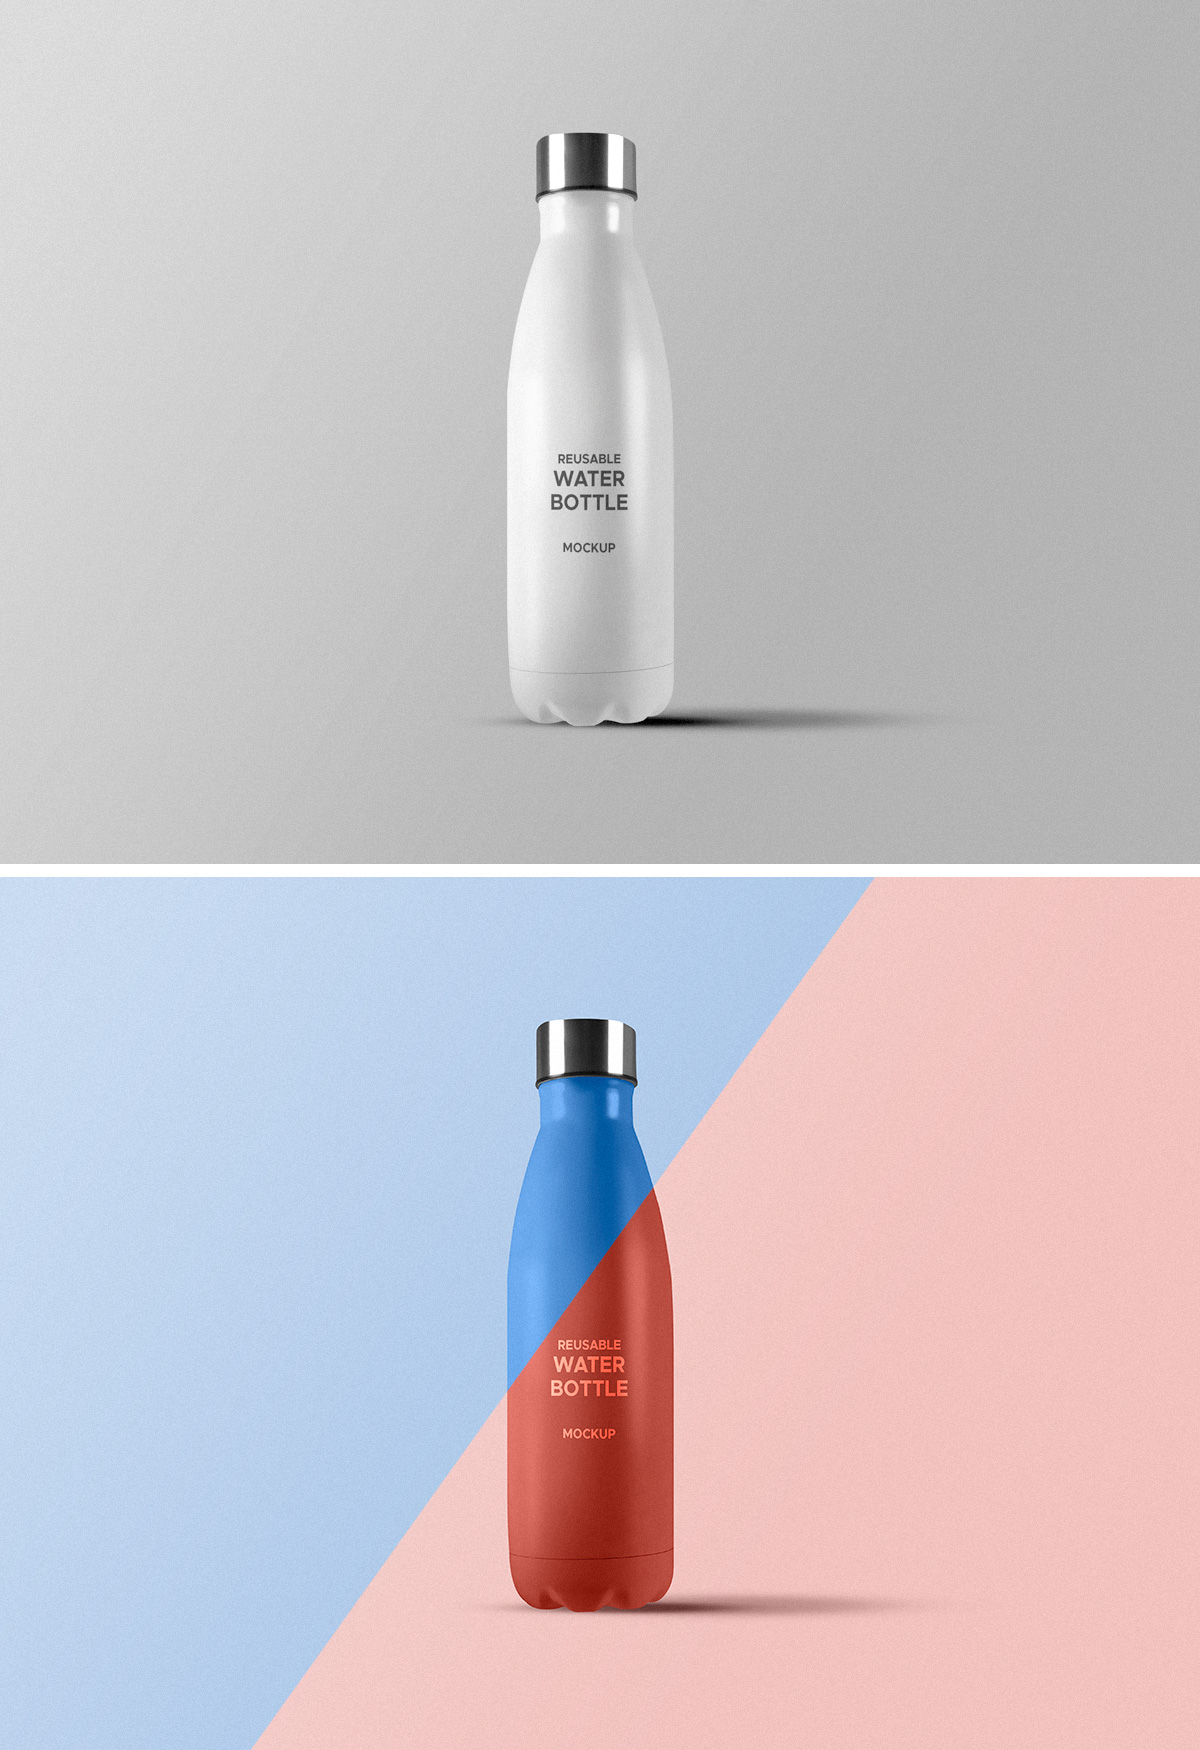 Reusable Water Bottle PSD Mockup